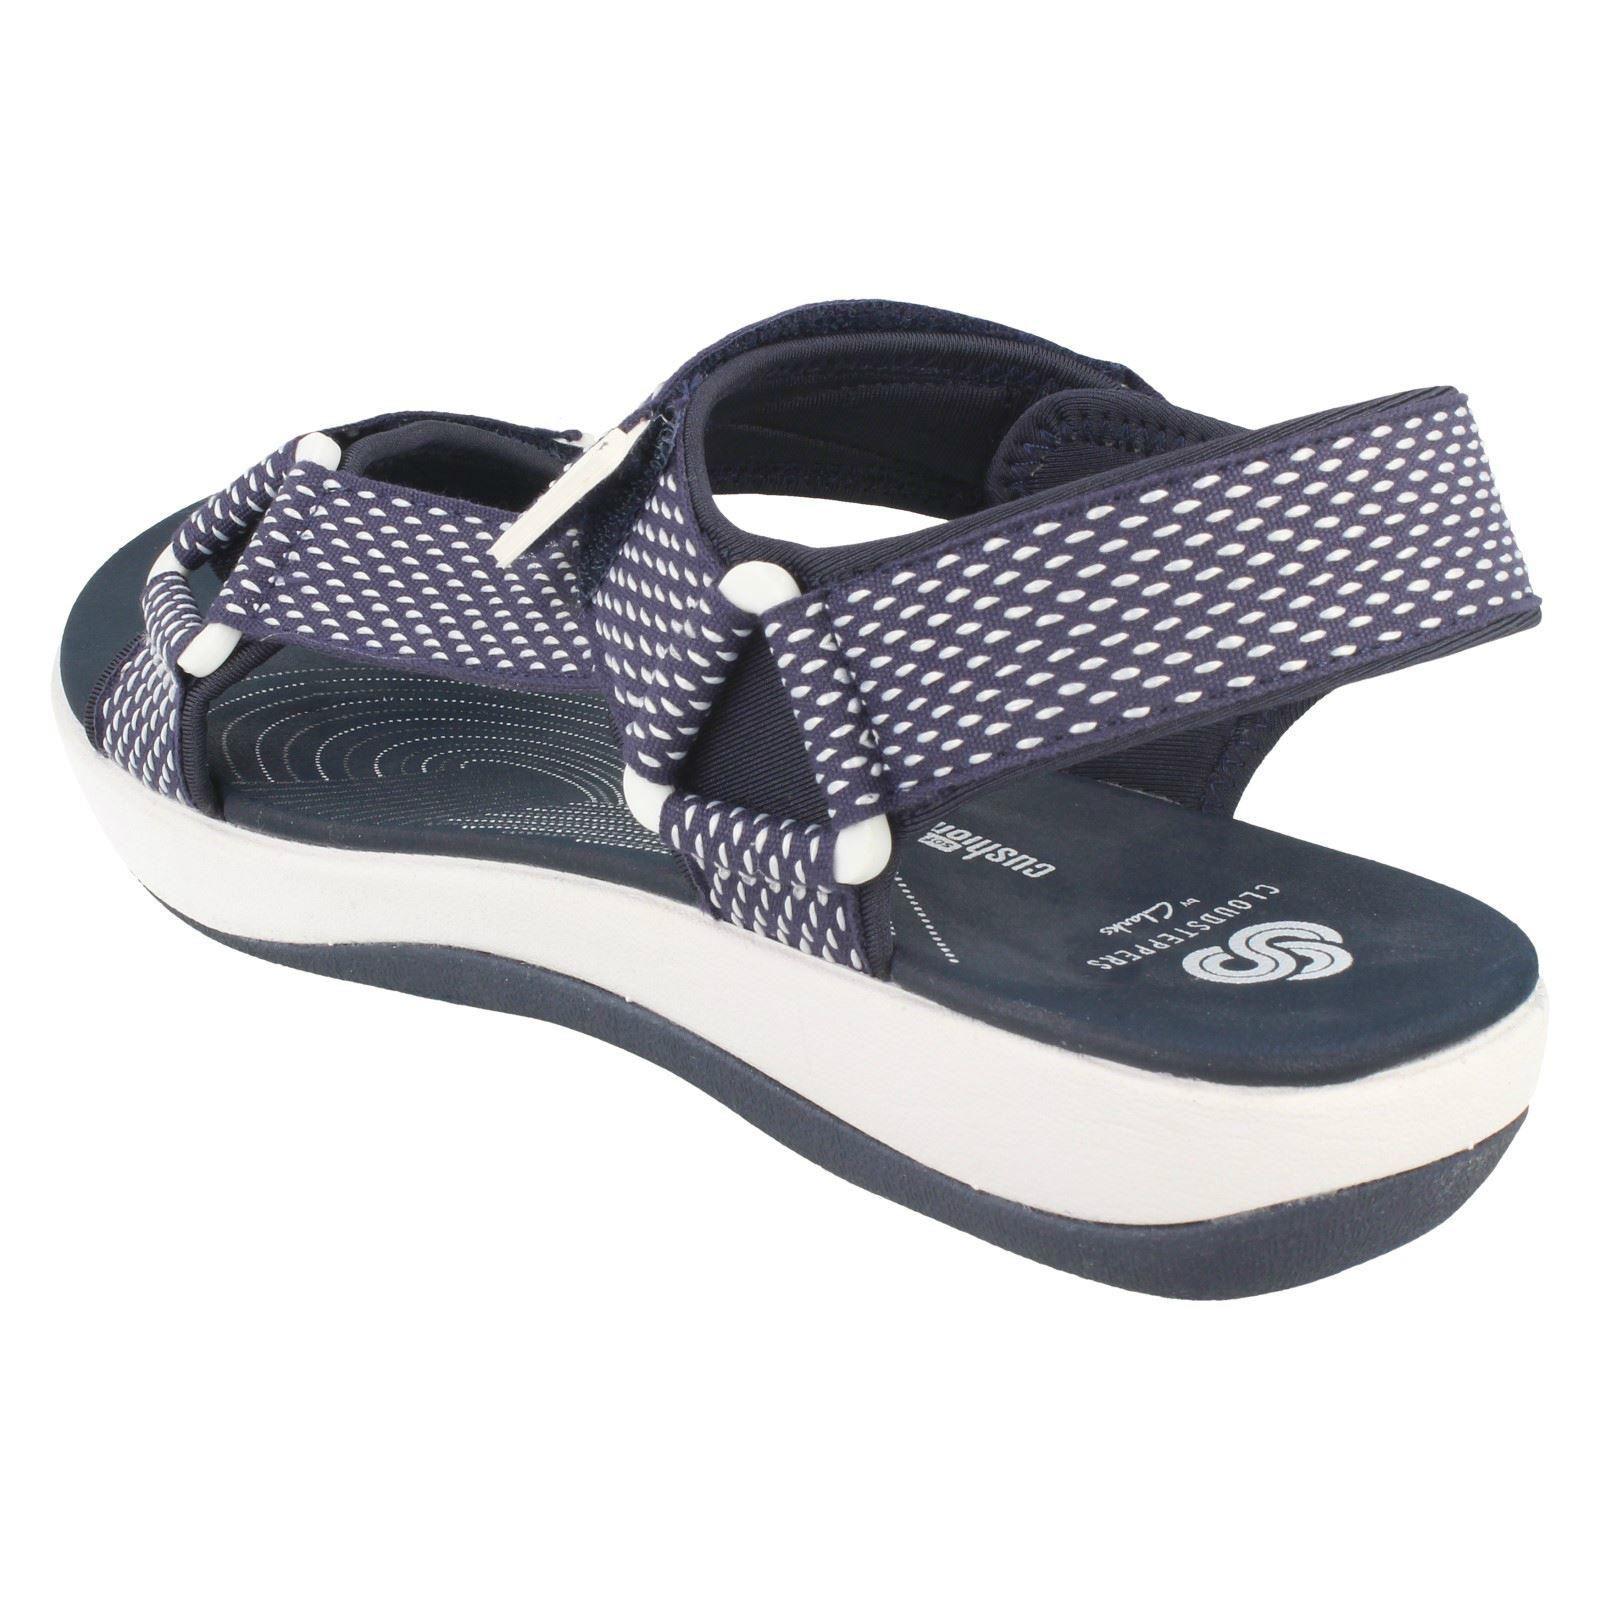 Ladies Clarks Brizo Cady Casual Strappy Sandals